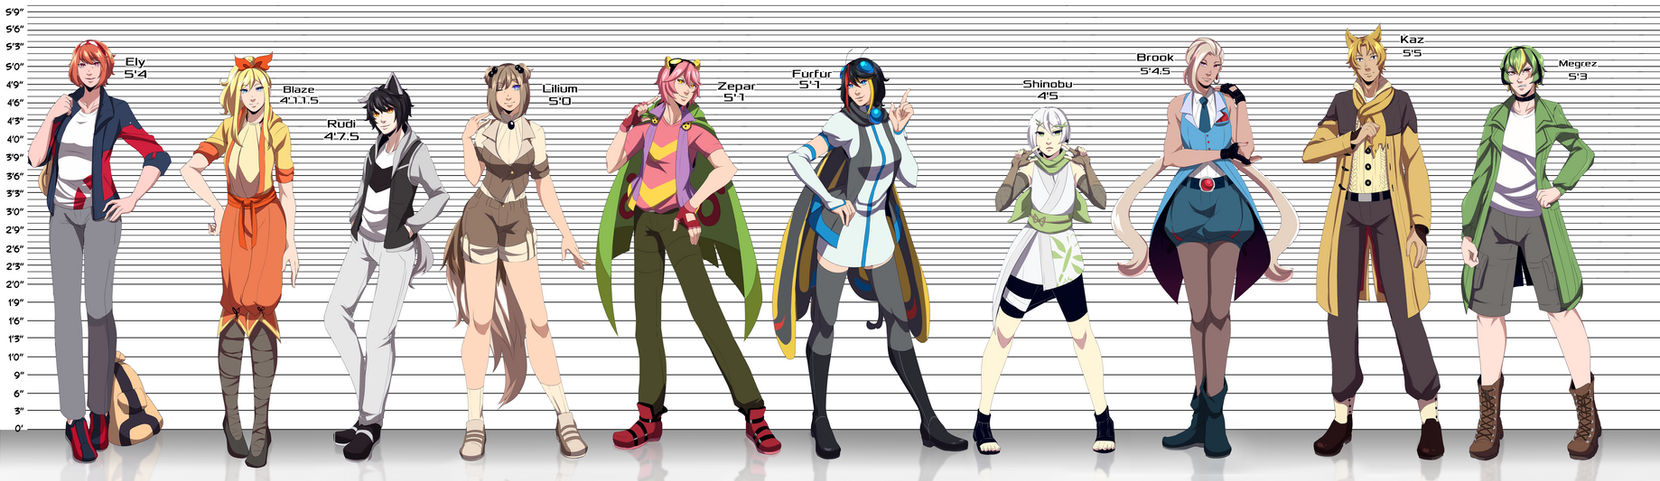 S.E (Ruby Nuzlocke) Ely's Party Height Chart by bekkomi